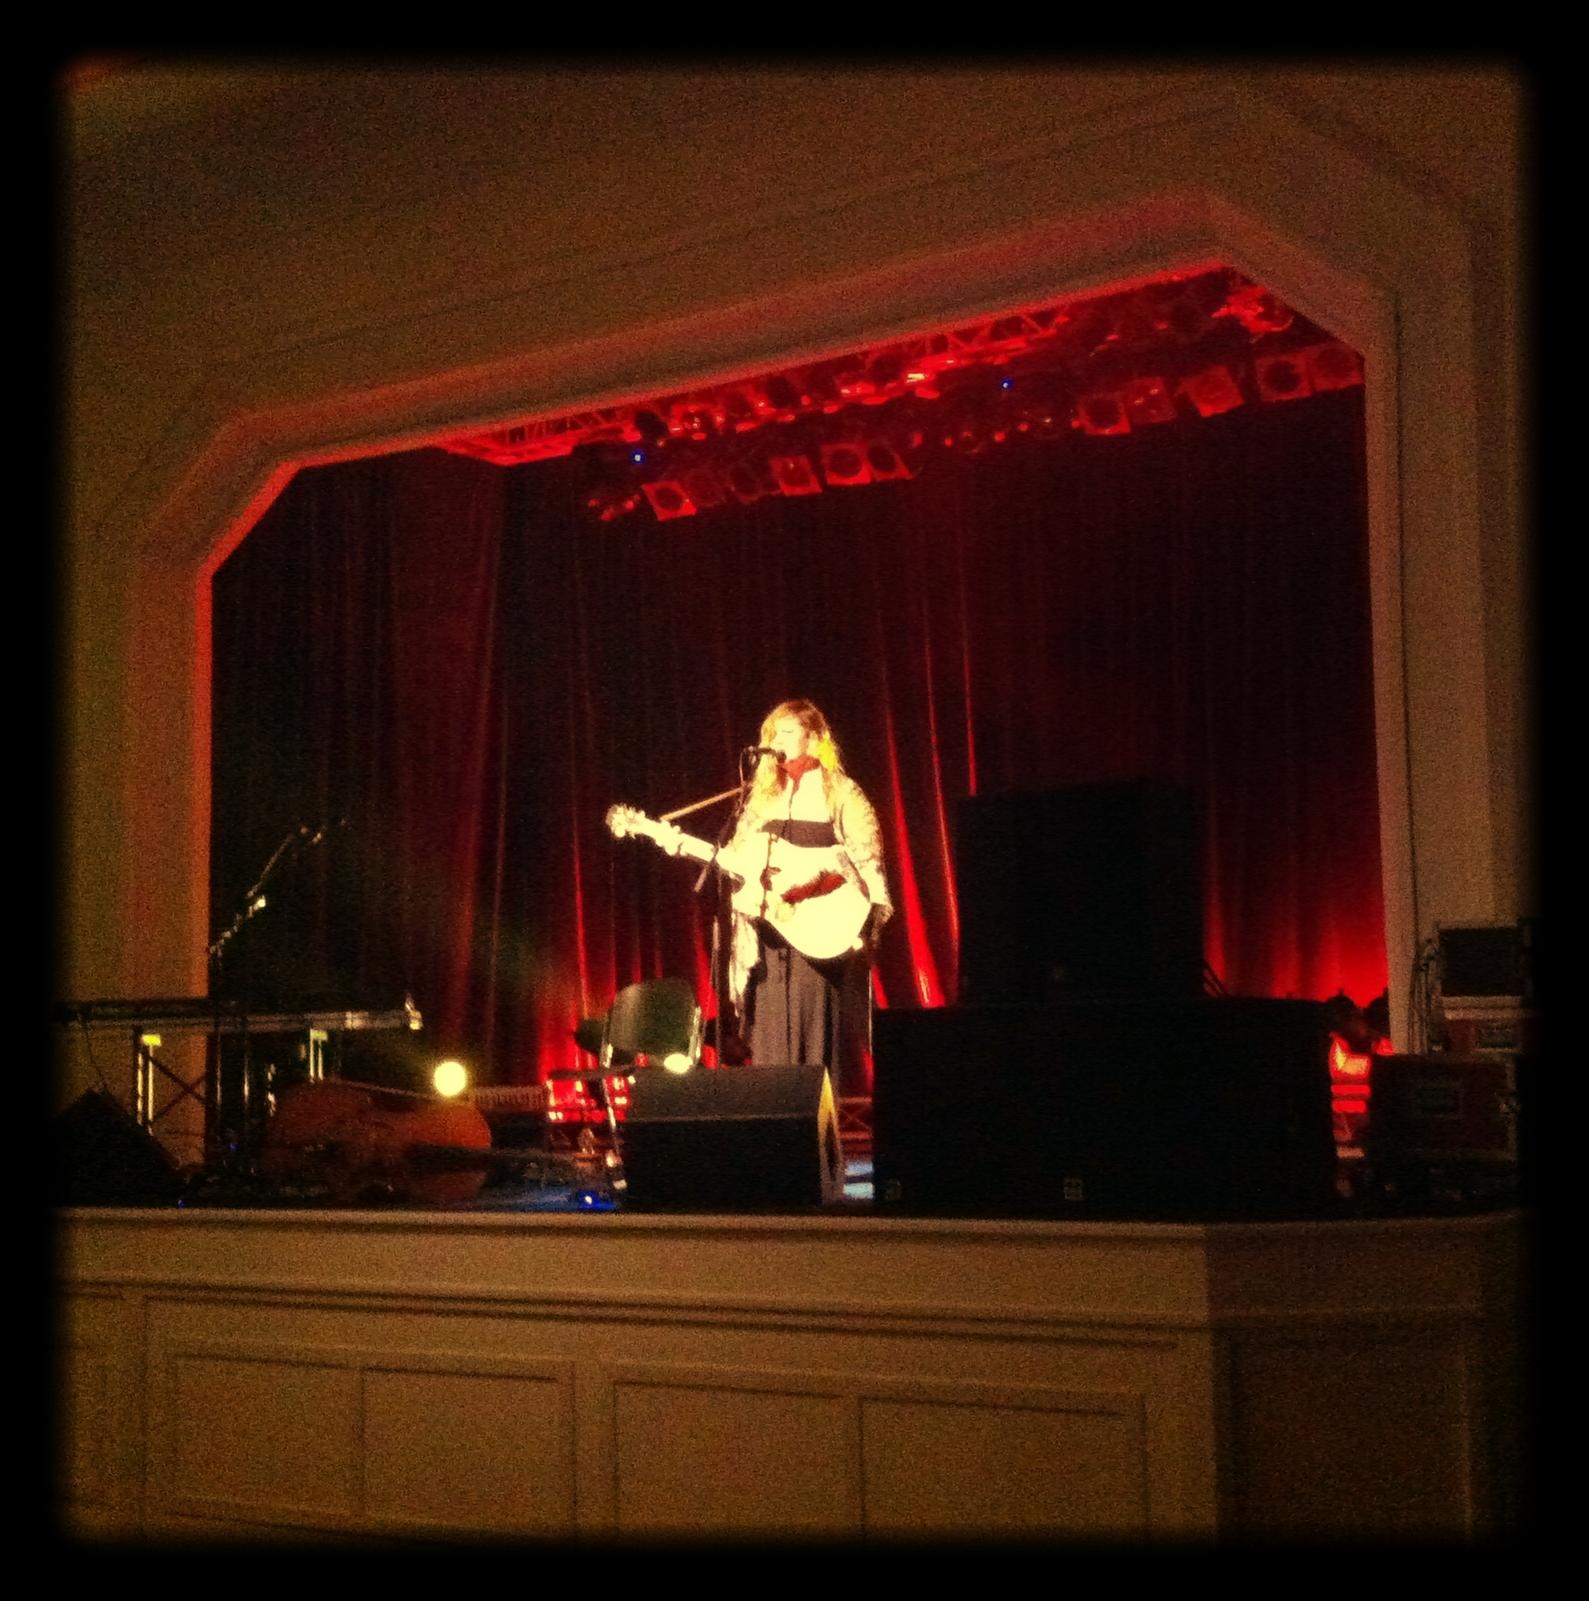 Lindsay_singing_in_Germany